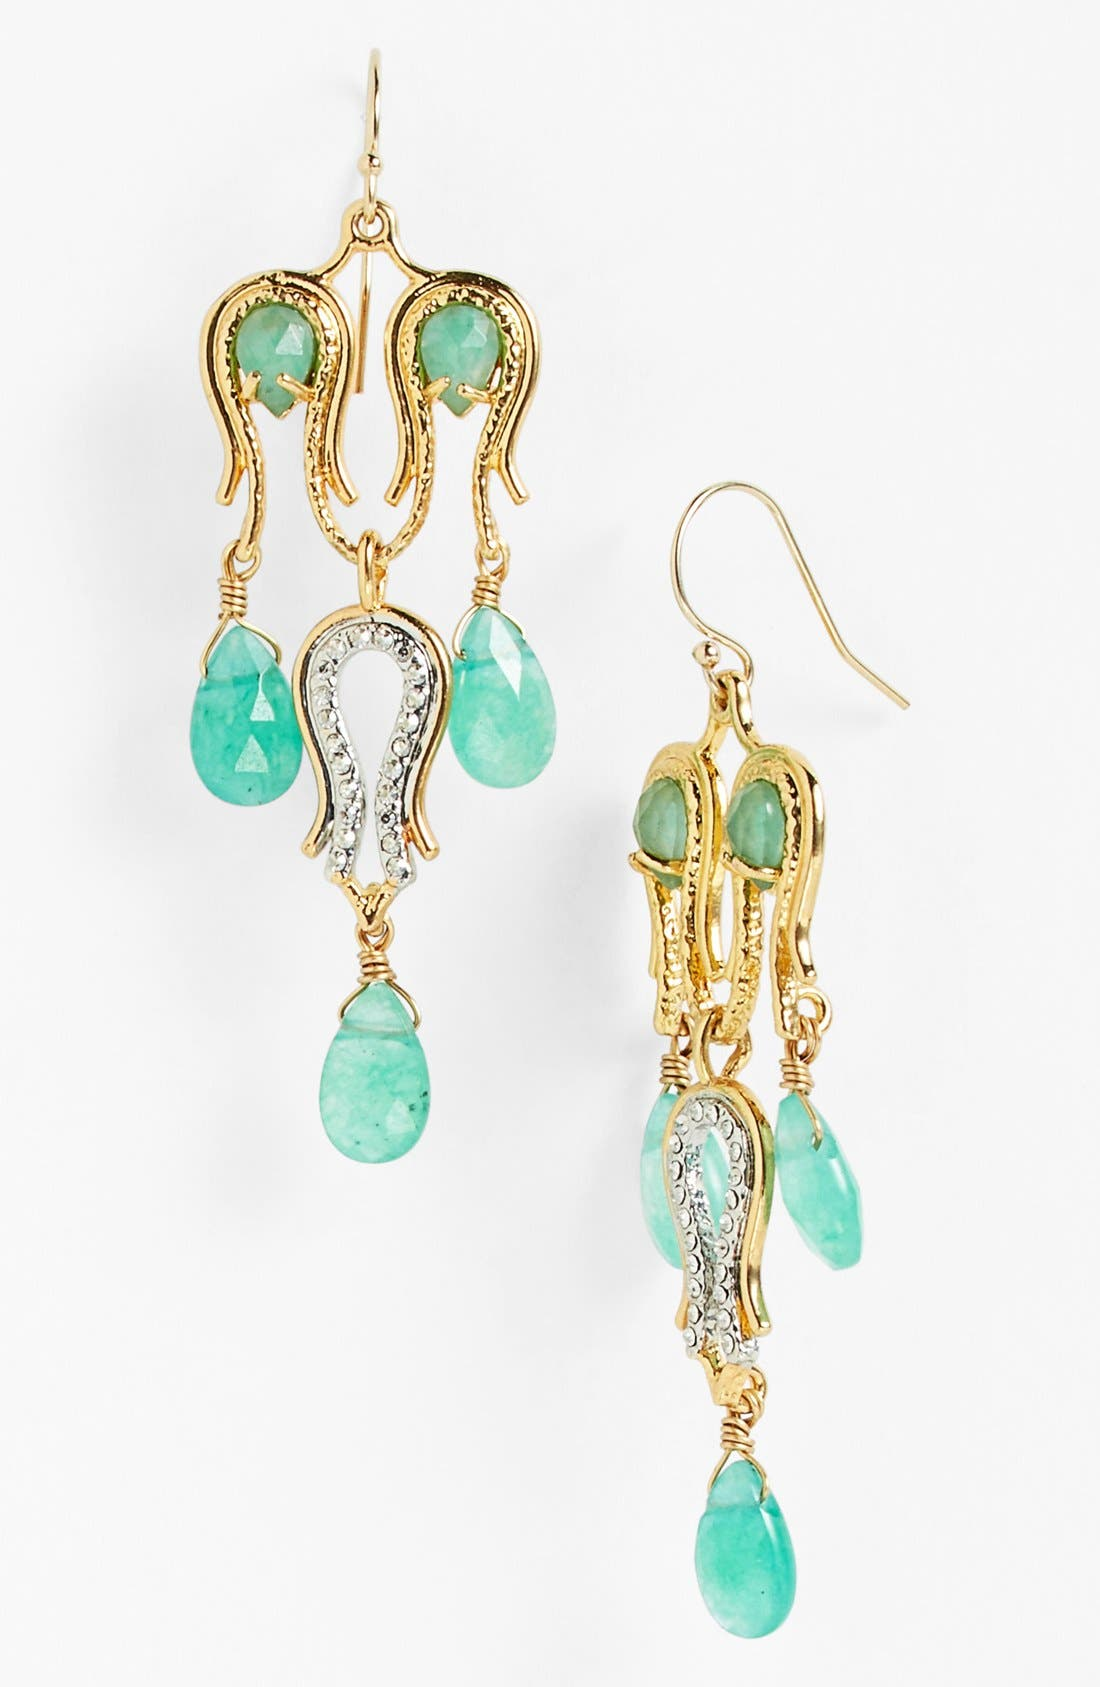 Main Image - Alexis Bittar 'Elements - Maldivian' Semiprecious Stone Chandelier Earrings